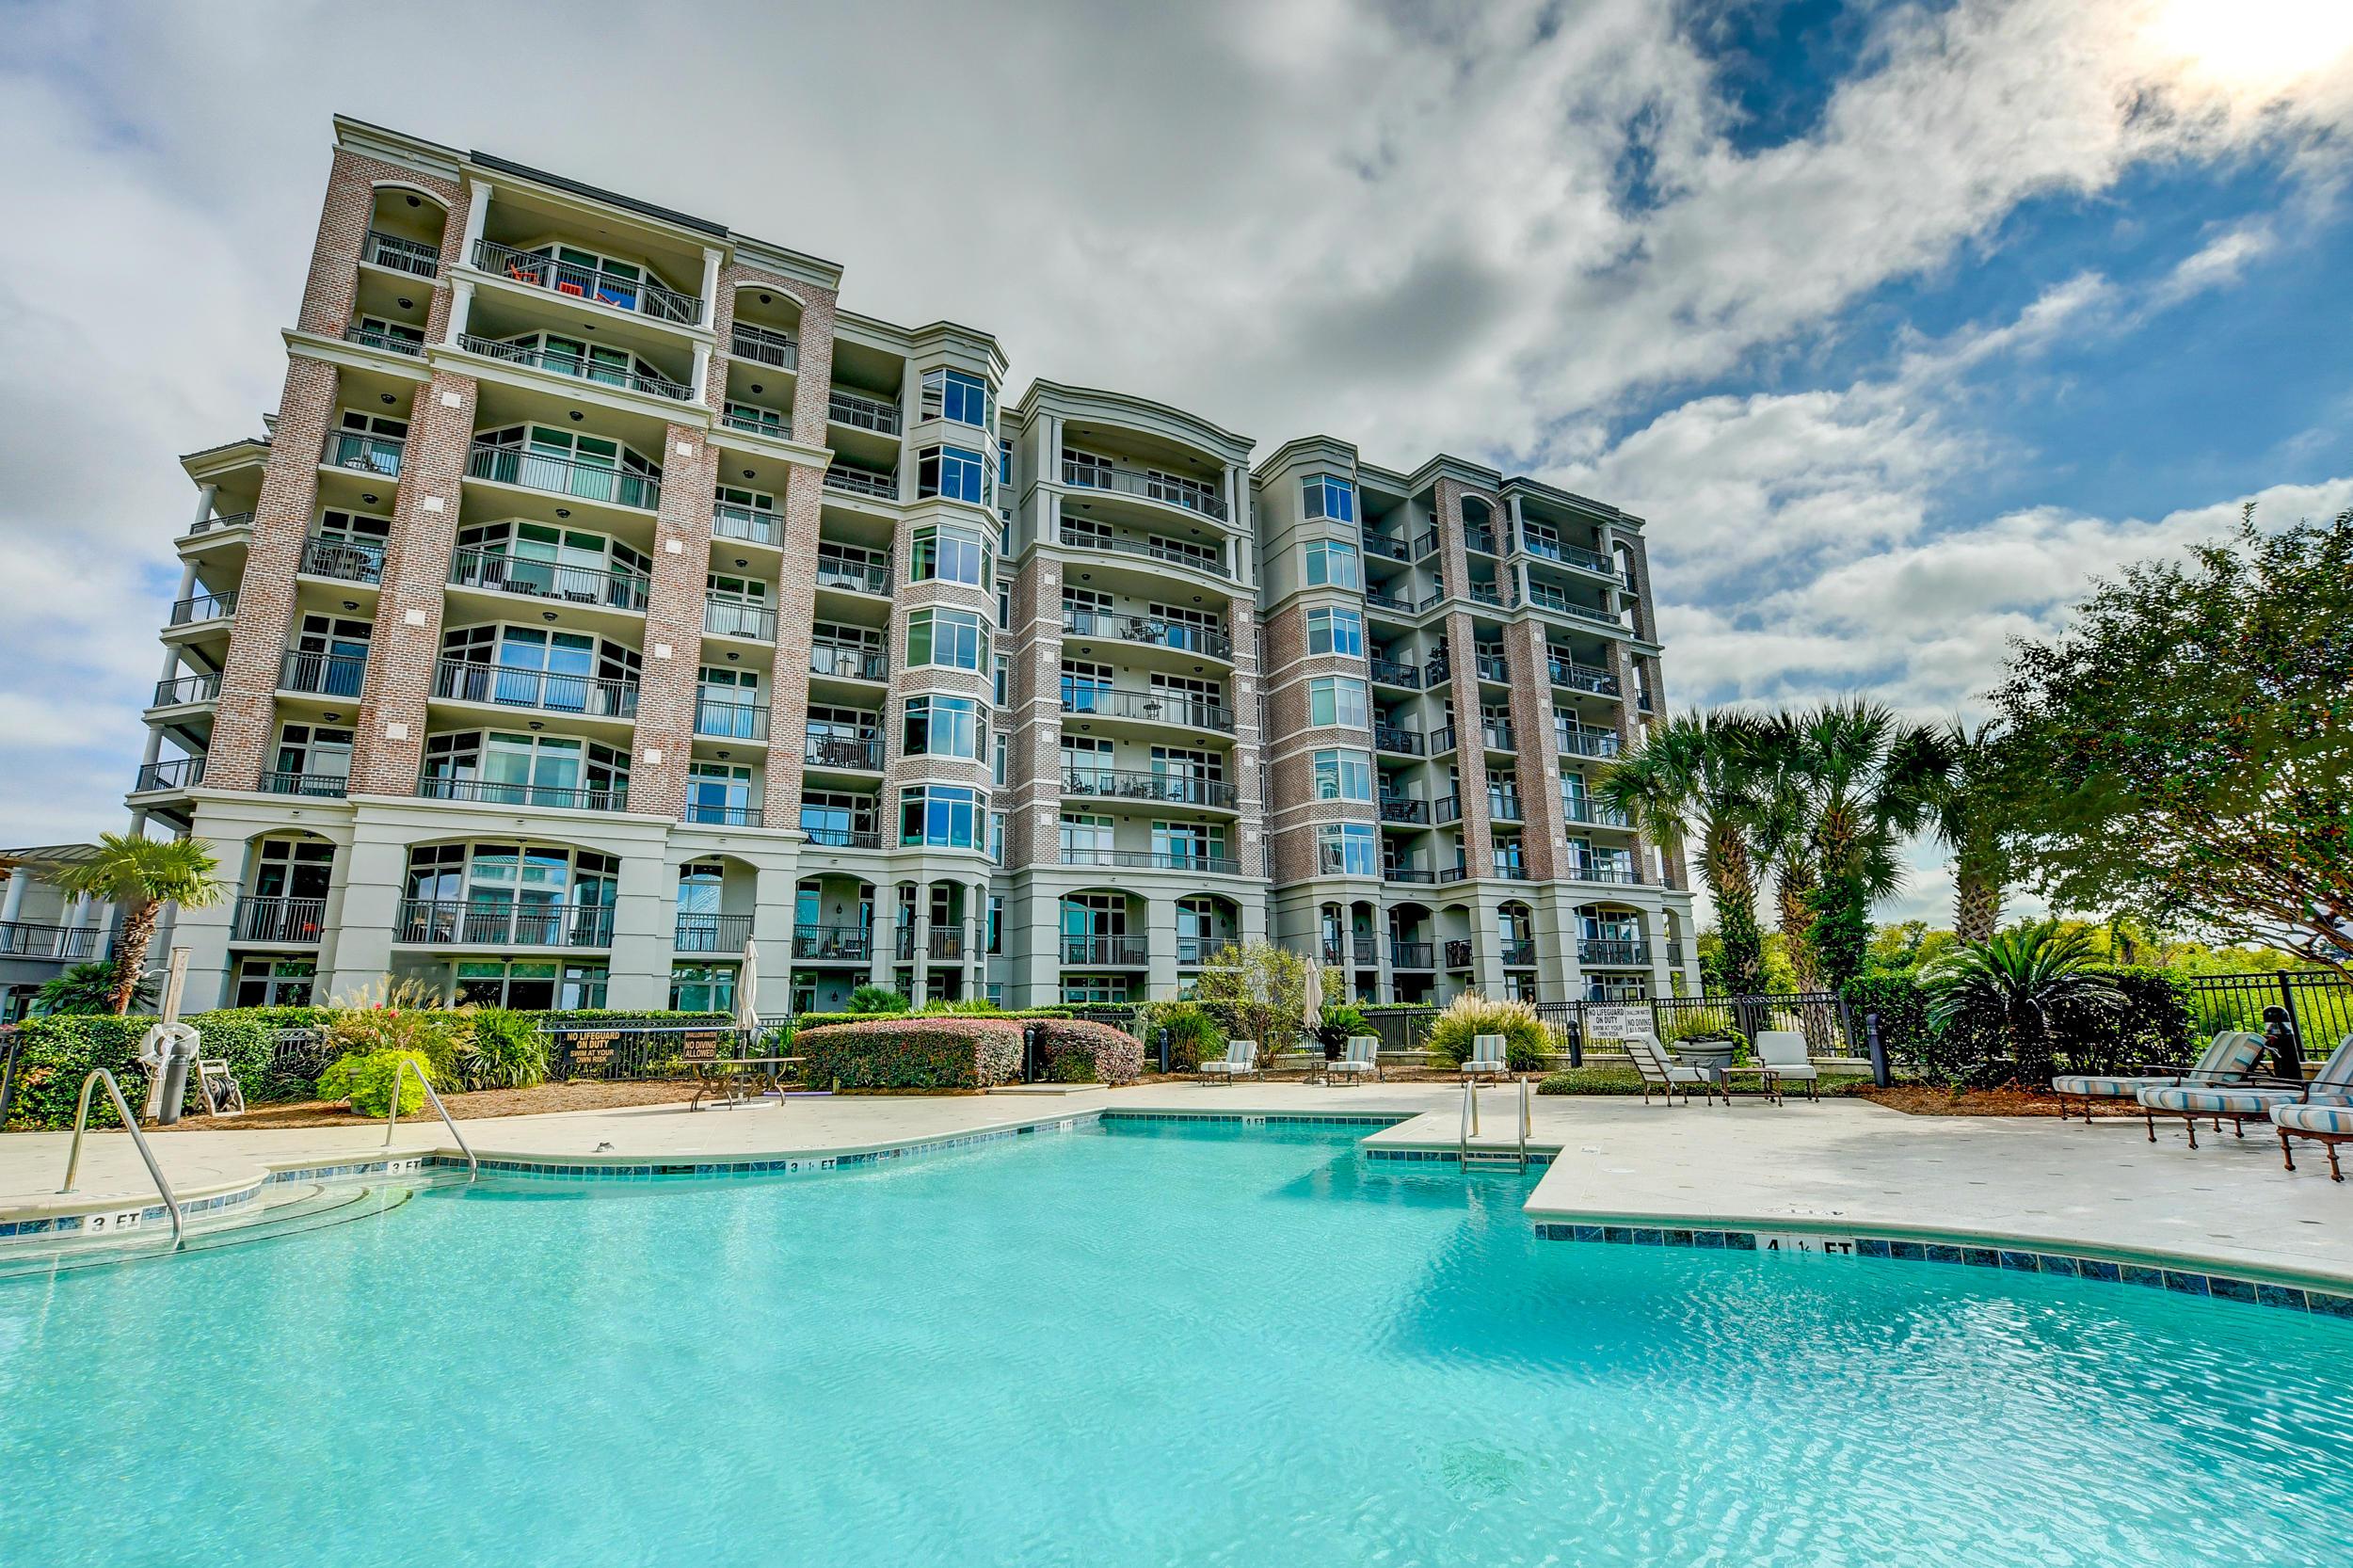 Renaissance On Chas Harbor Homes For Sale - 224 Plaza, Mount Pleasant, SC - 0